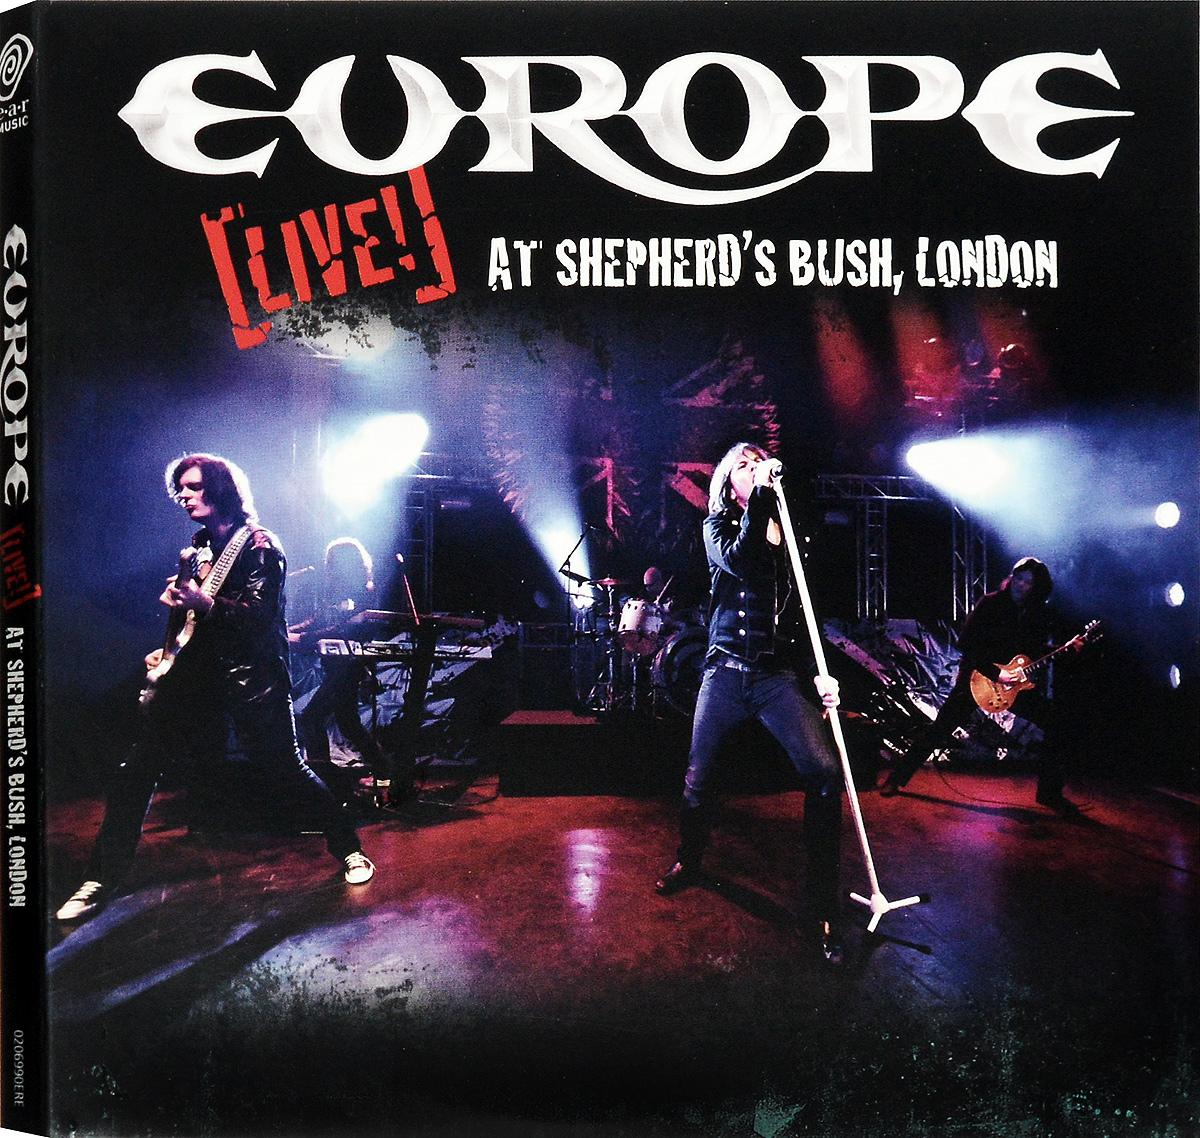 Europe Europe. Live! At Shepherd's Bush, London (CD + DVD)